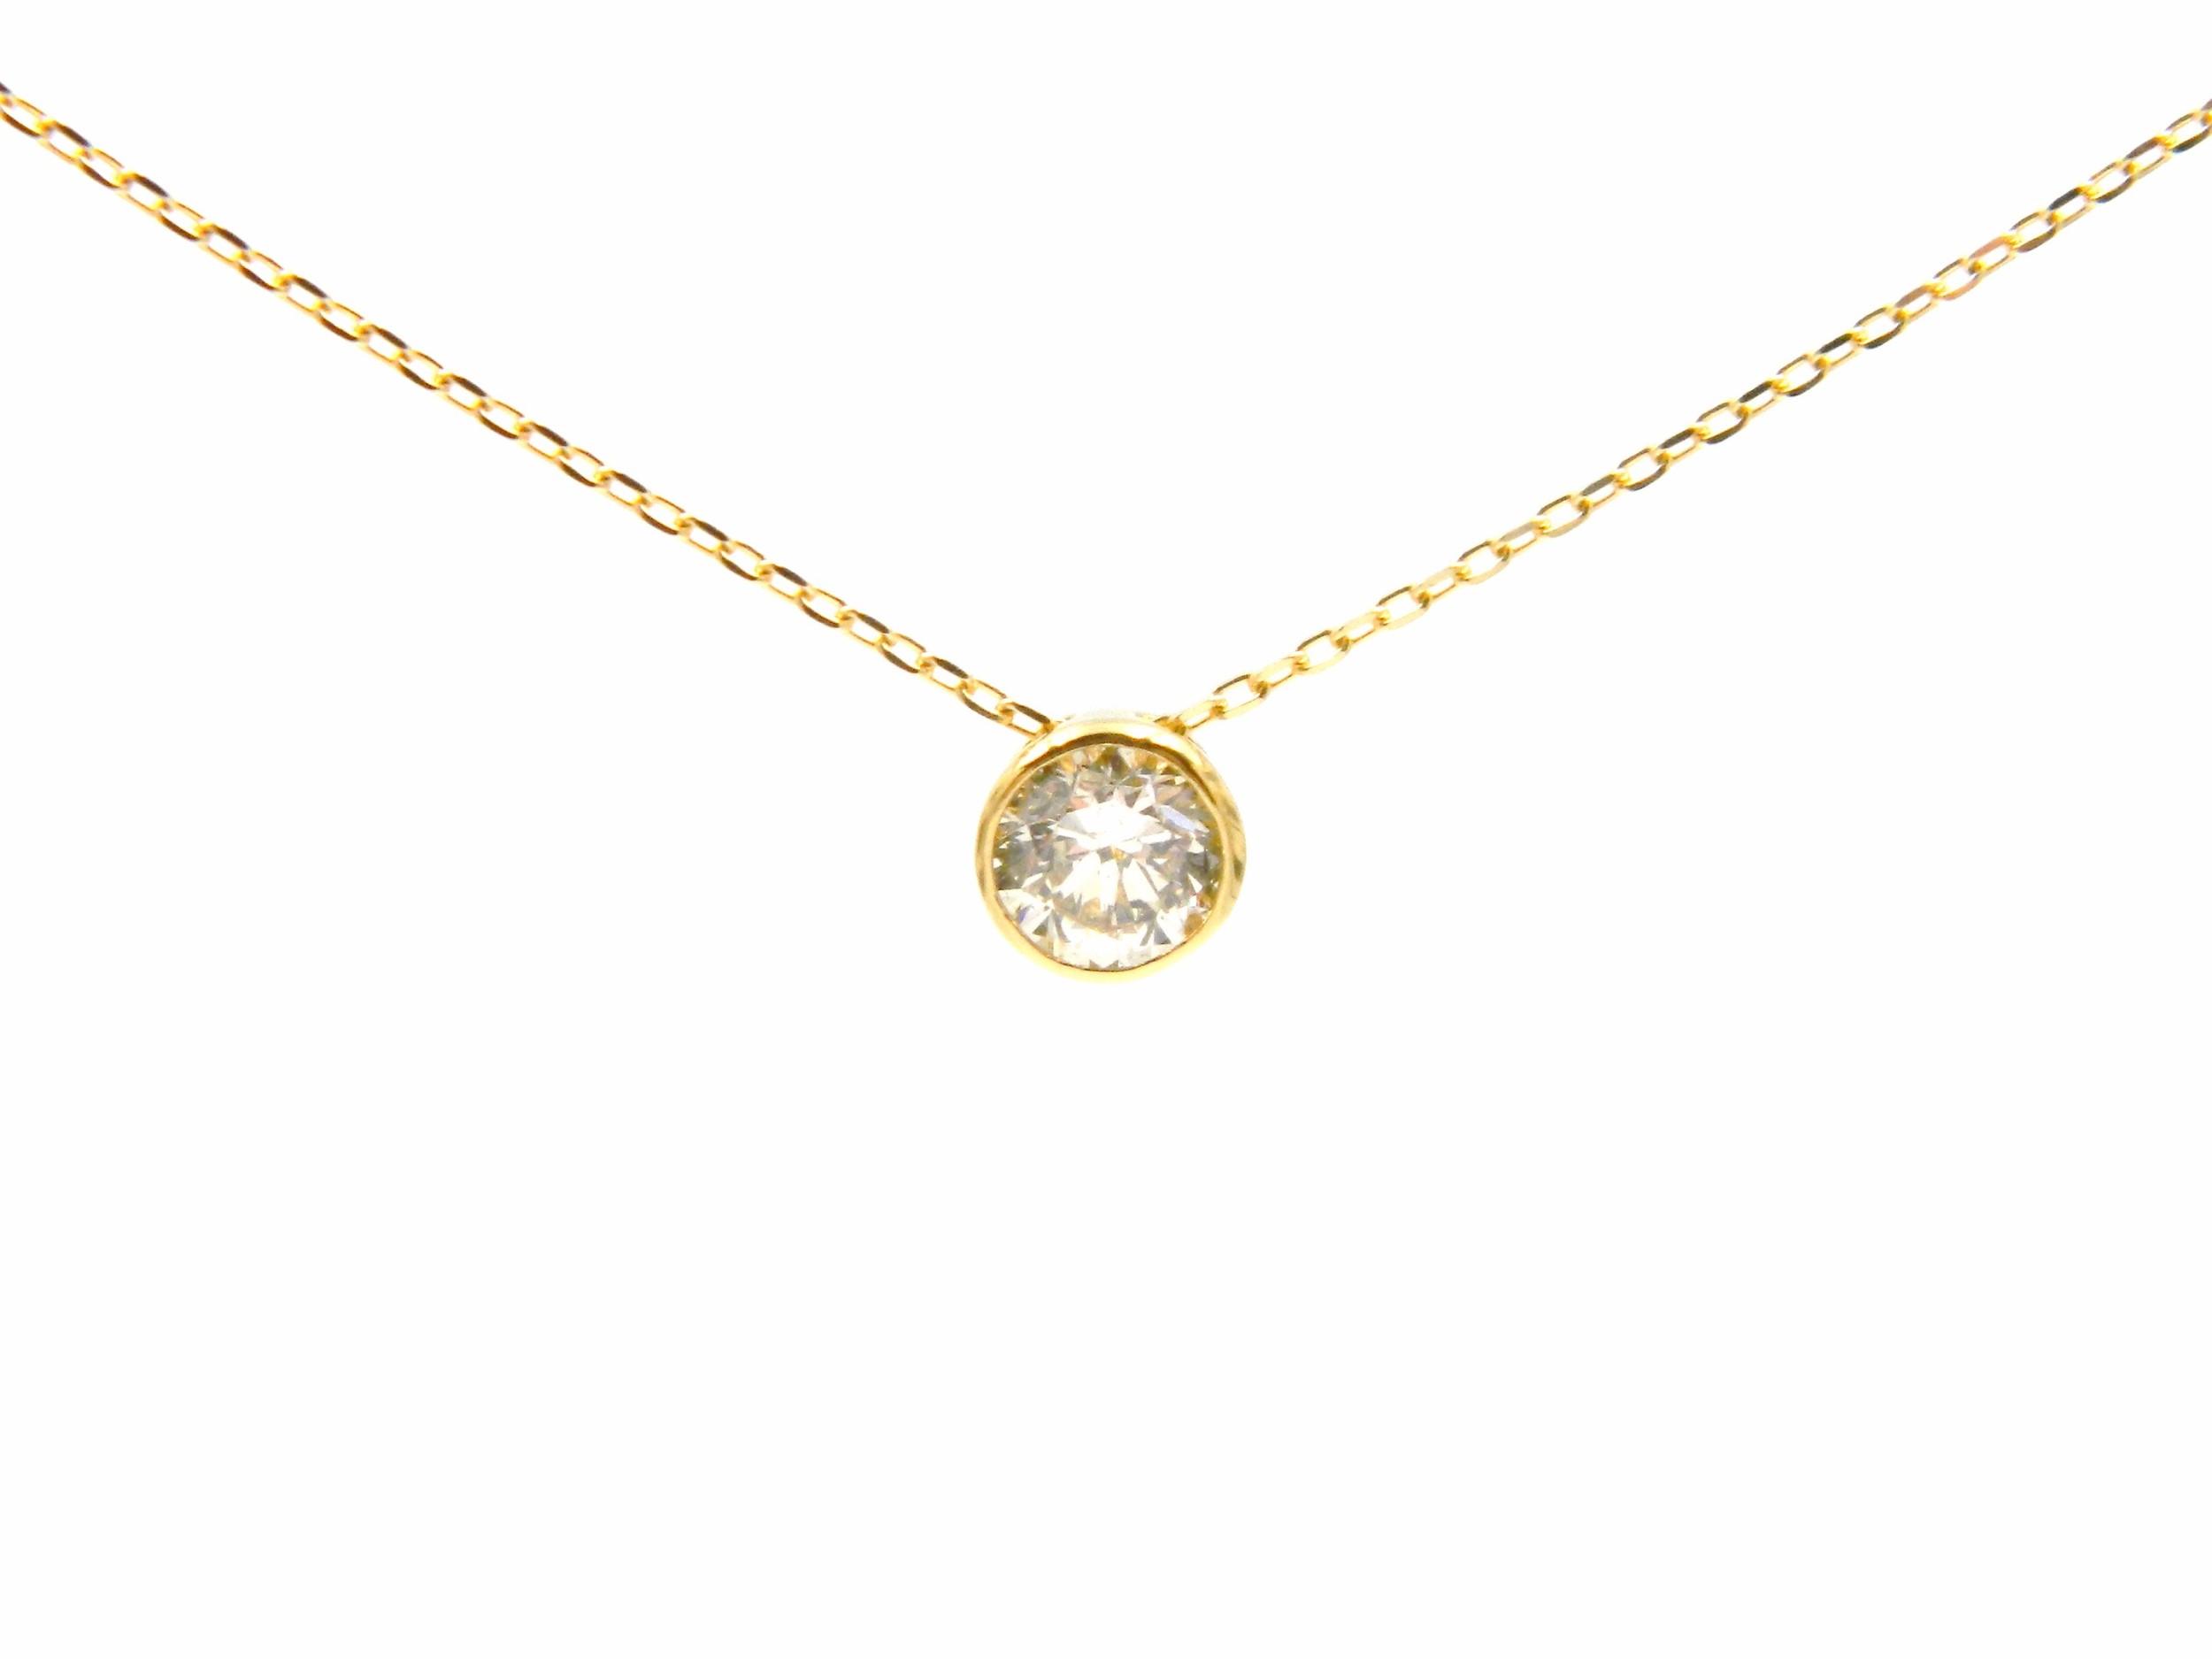 Yellow Gold Diamond Pendant Necklace